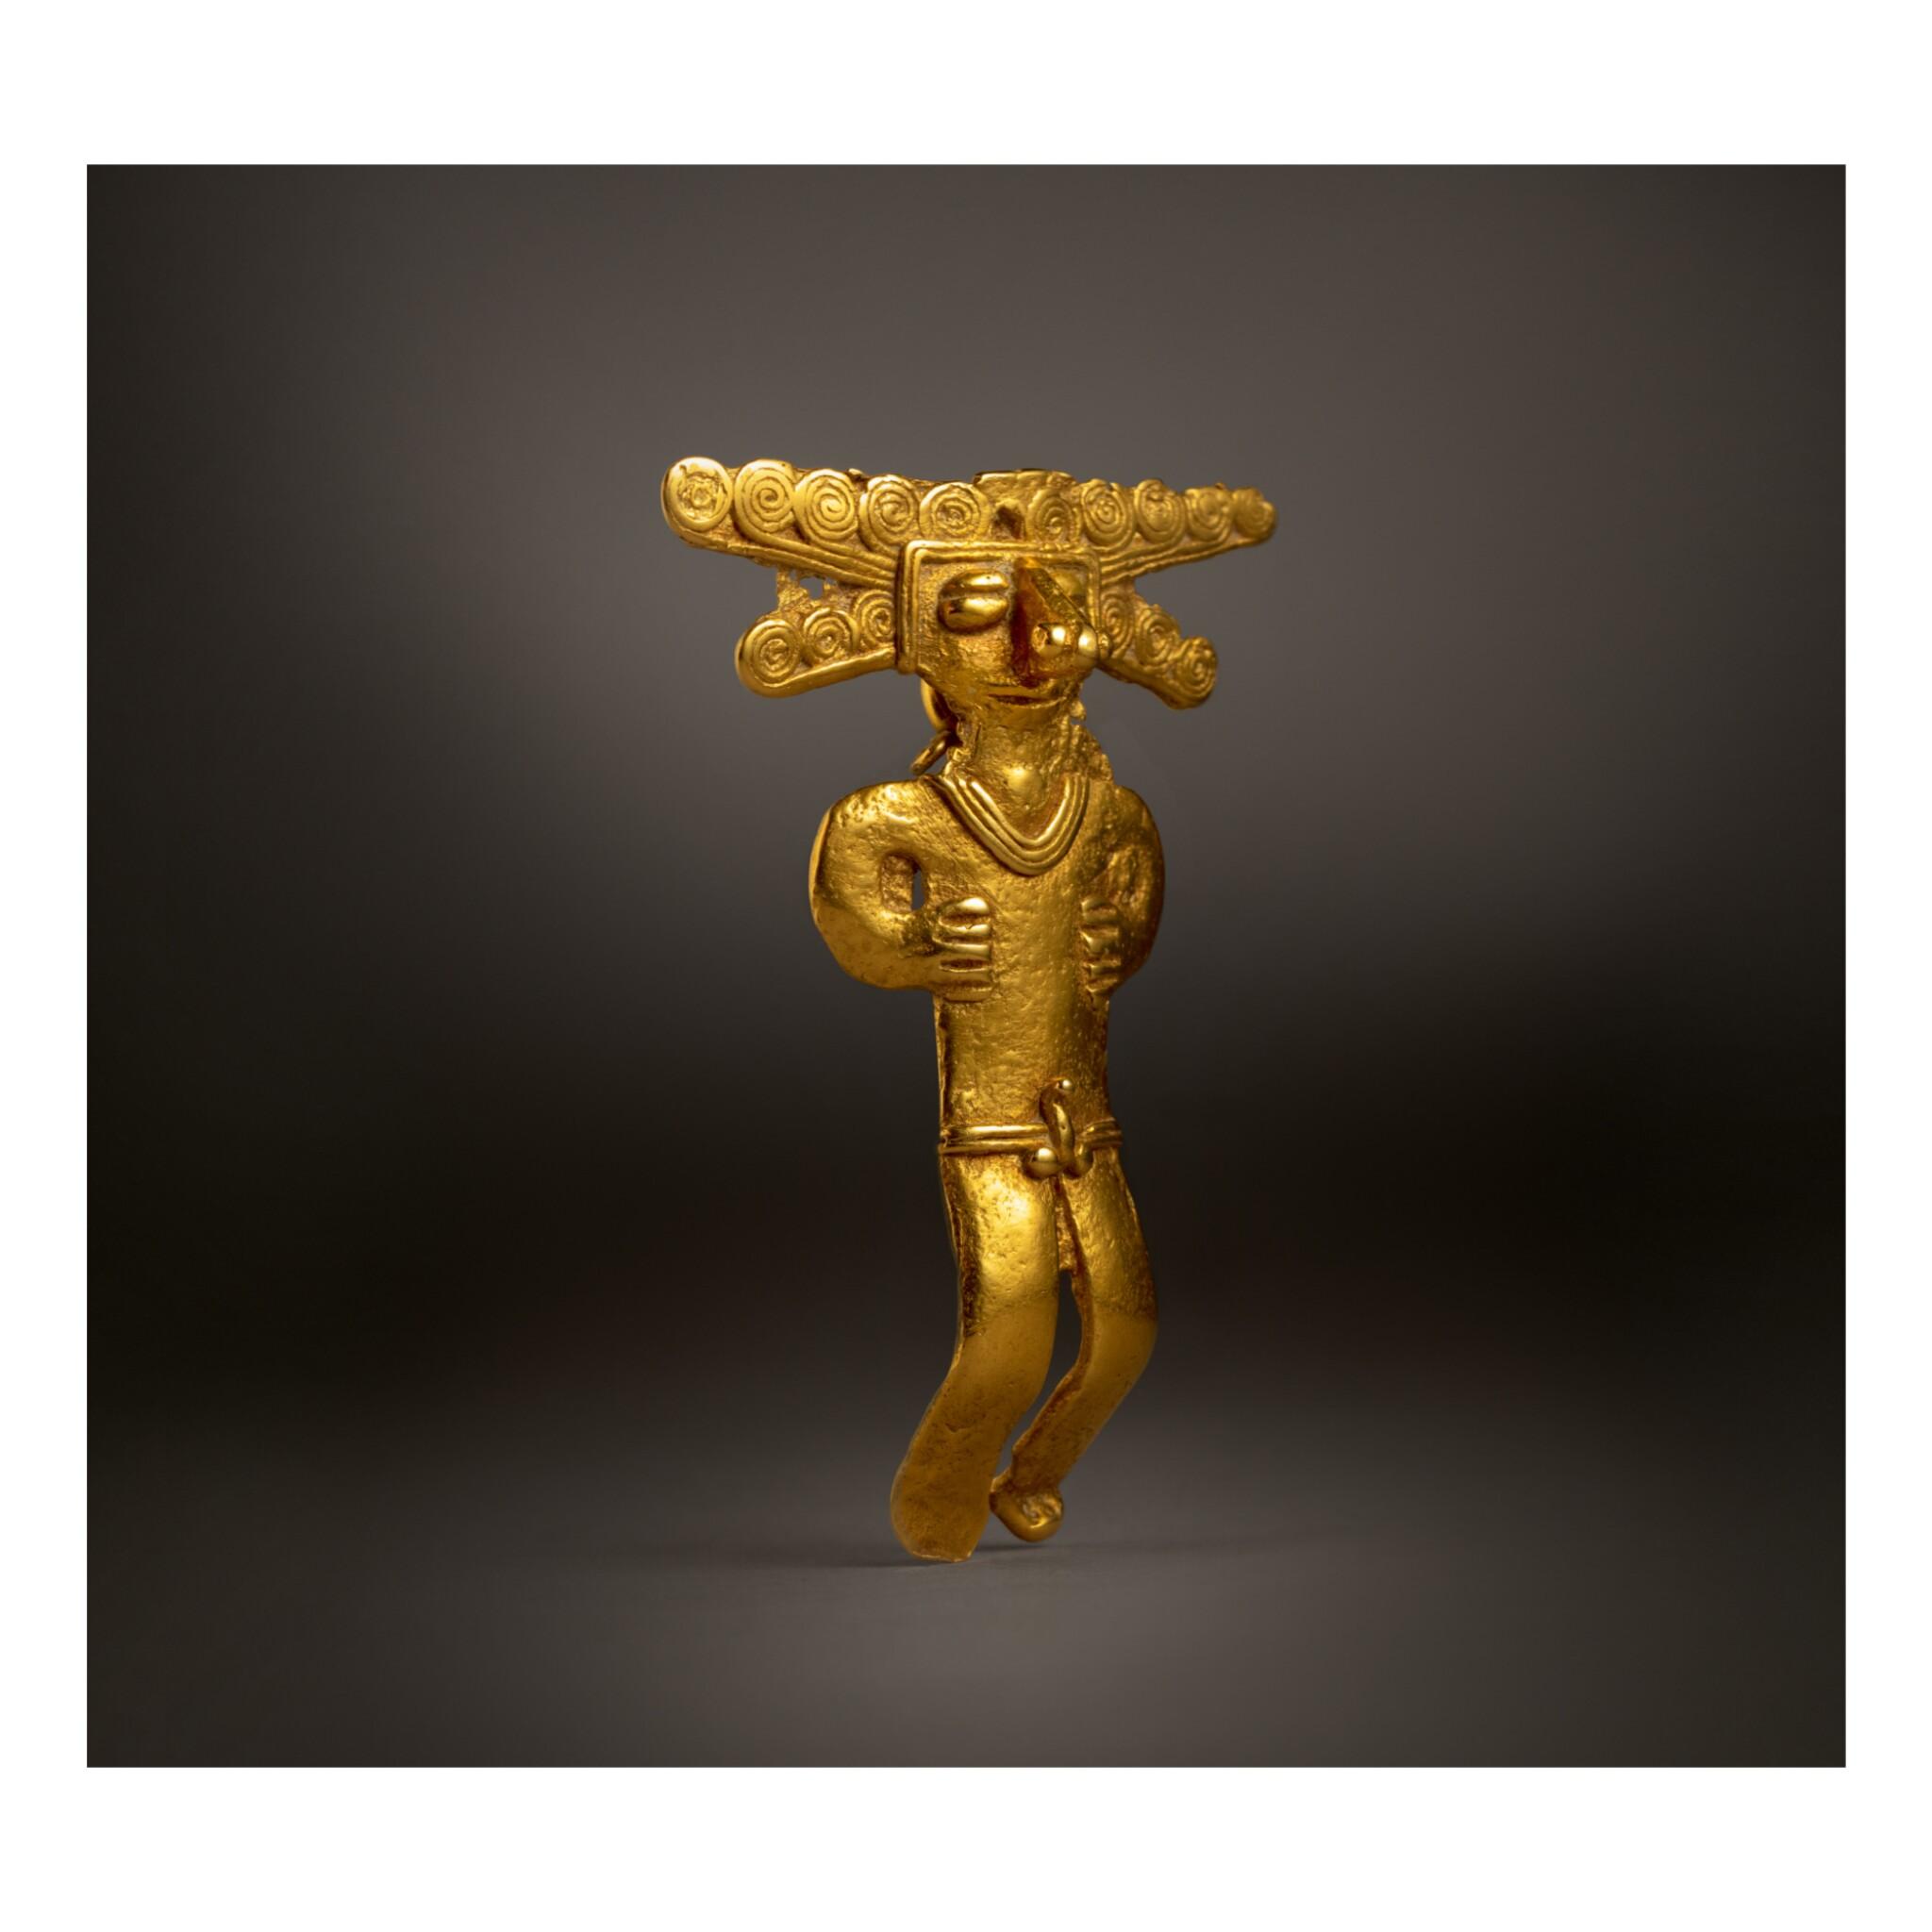 COLOMBIAN GOLD FIGURAL PENDANT, TOLIMA OR QUIMBAYA REGION CIRCA AD 500-1000